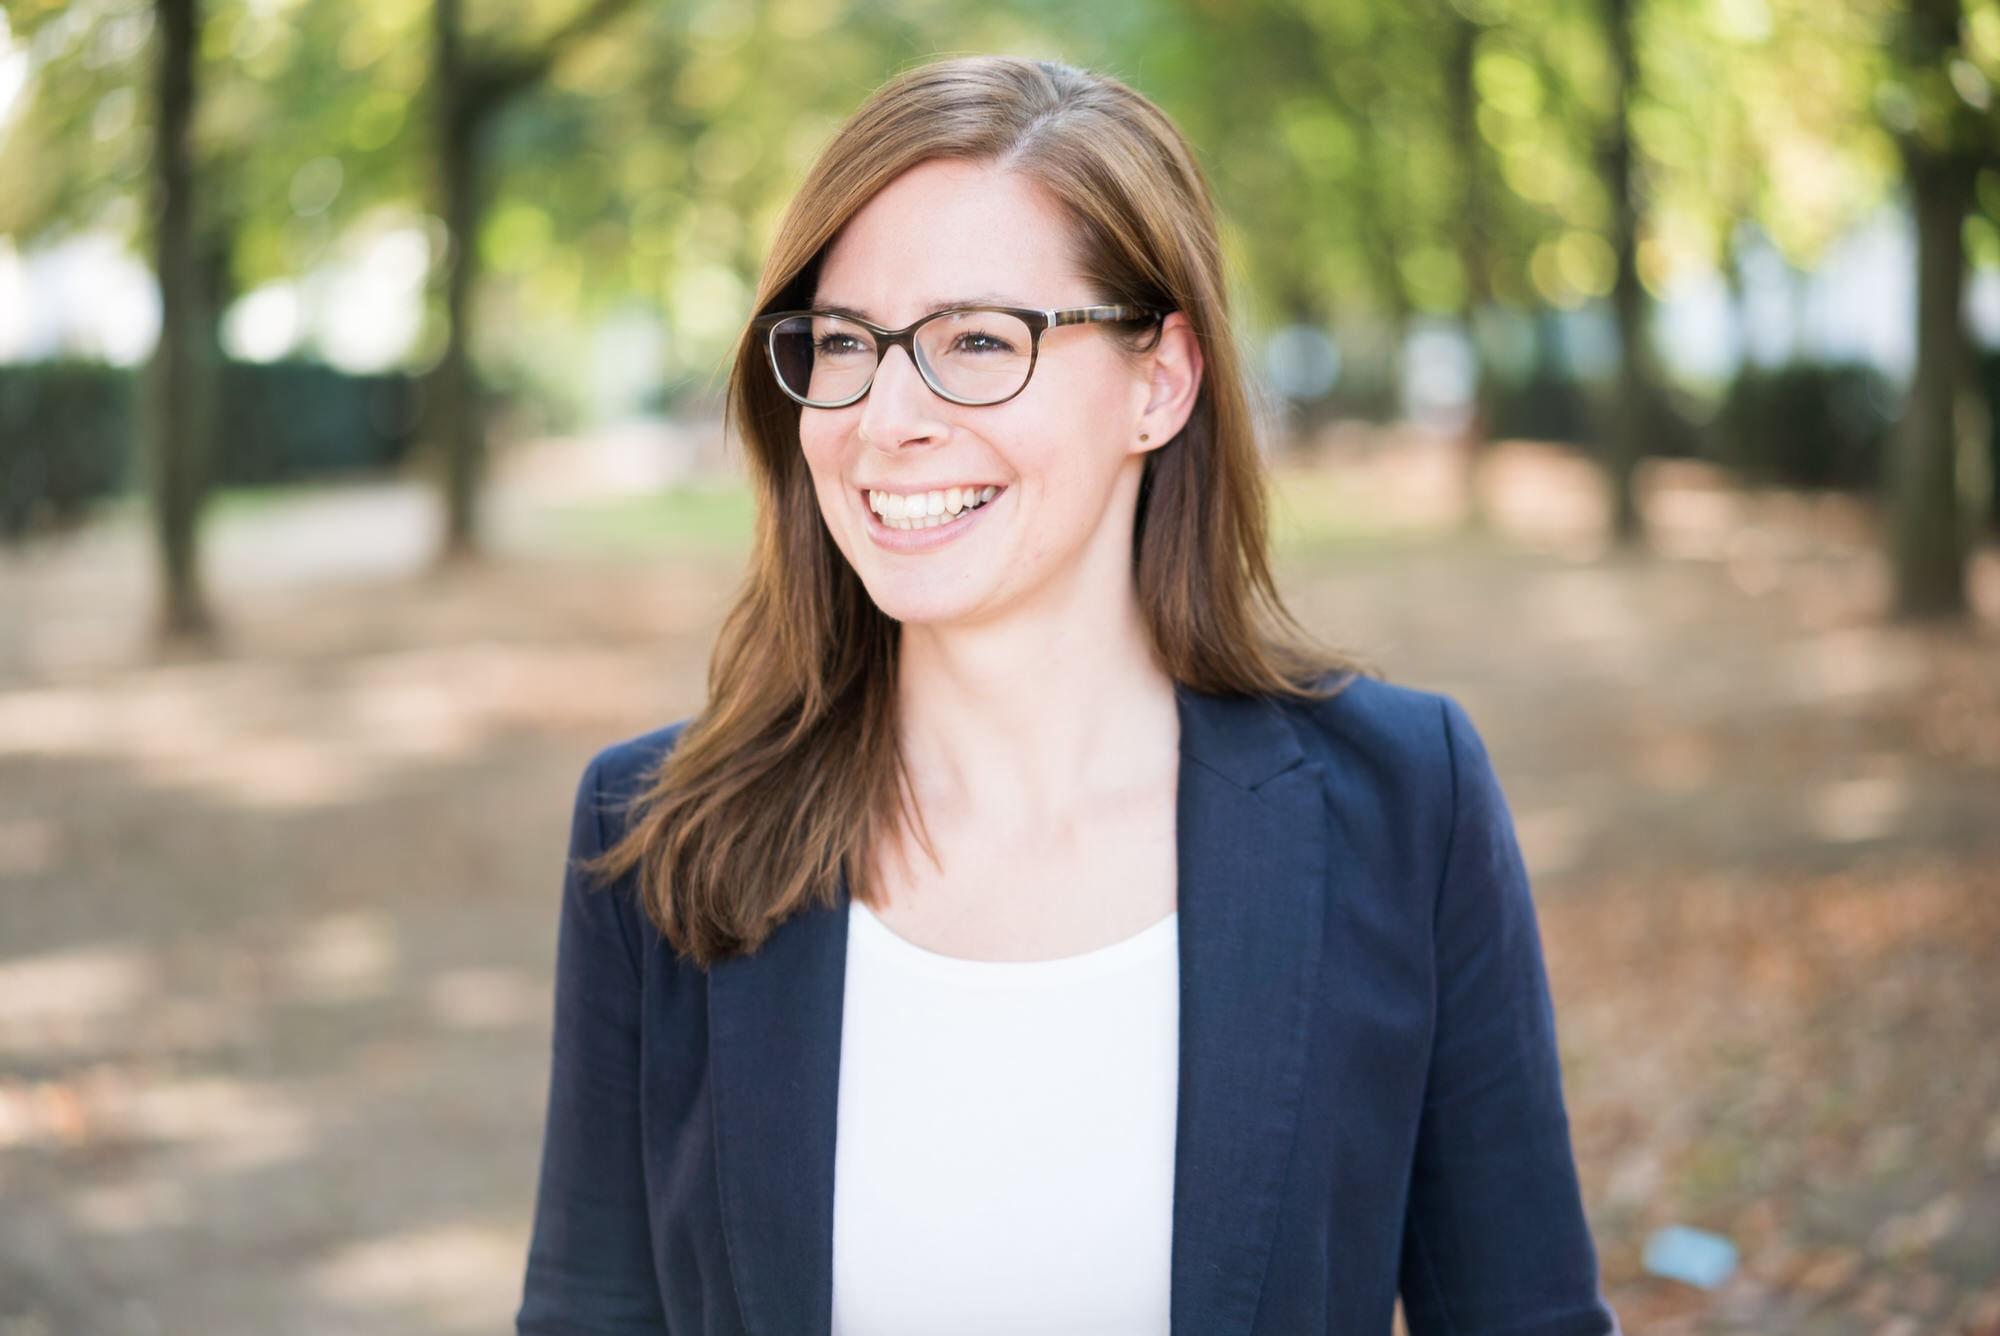 Fotograf Wiesbaden Business Portrait